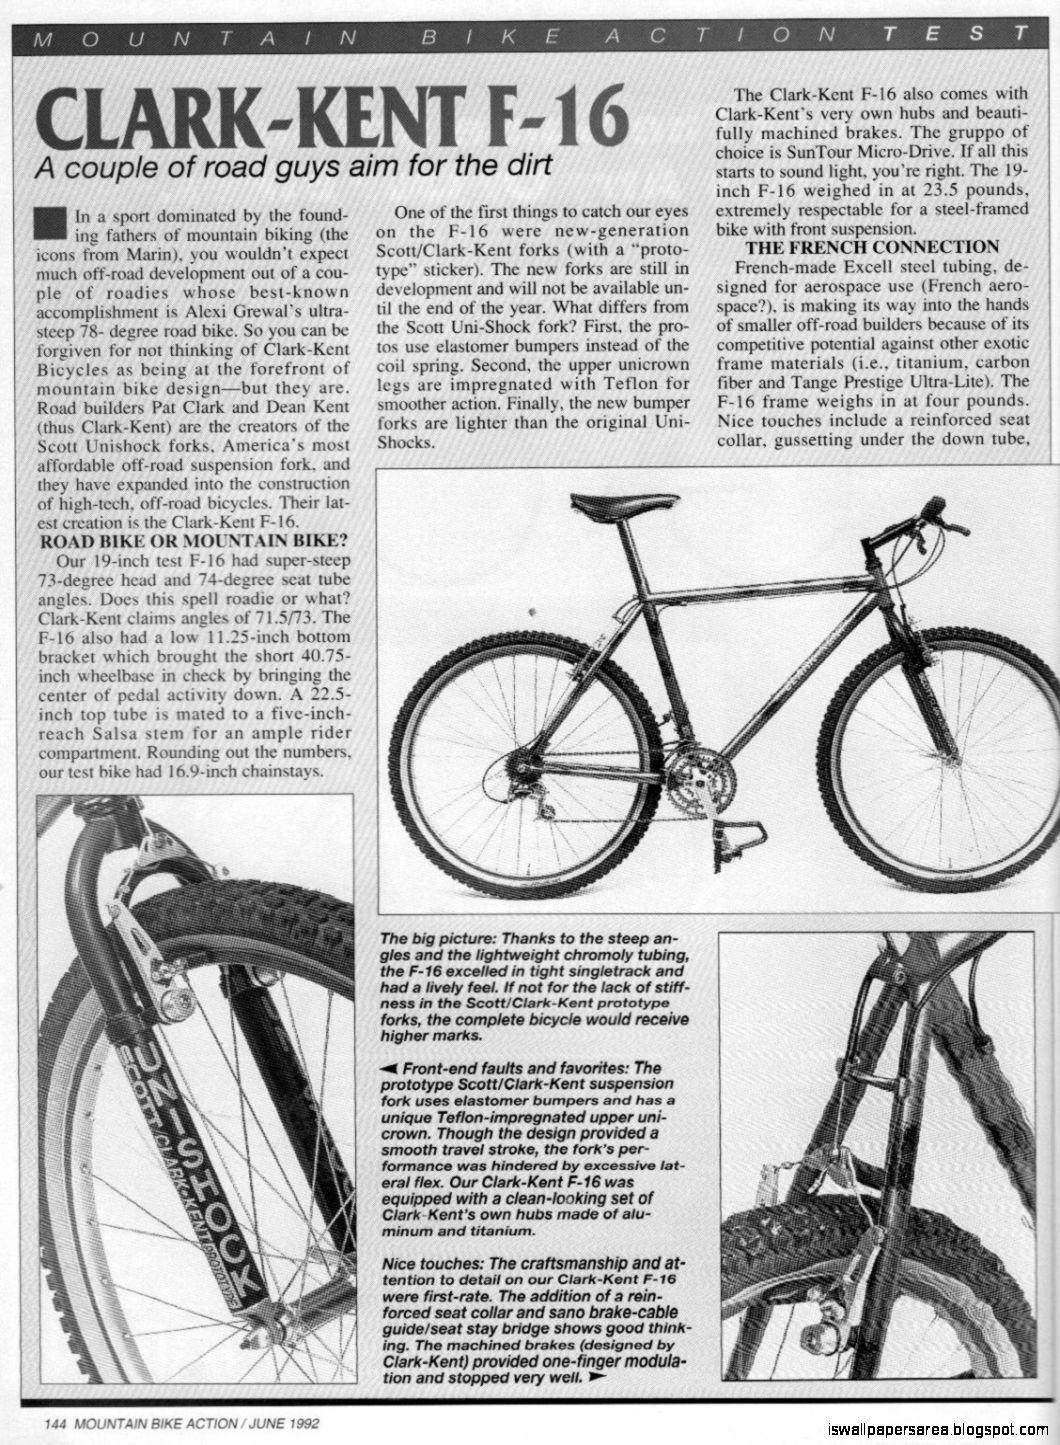 mombat-clark-kent-bicycles-history.jpg